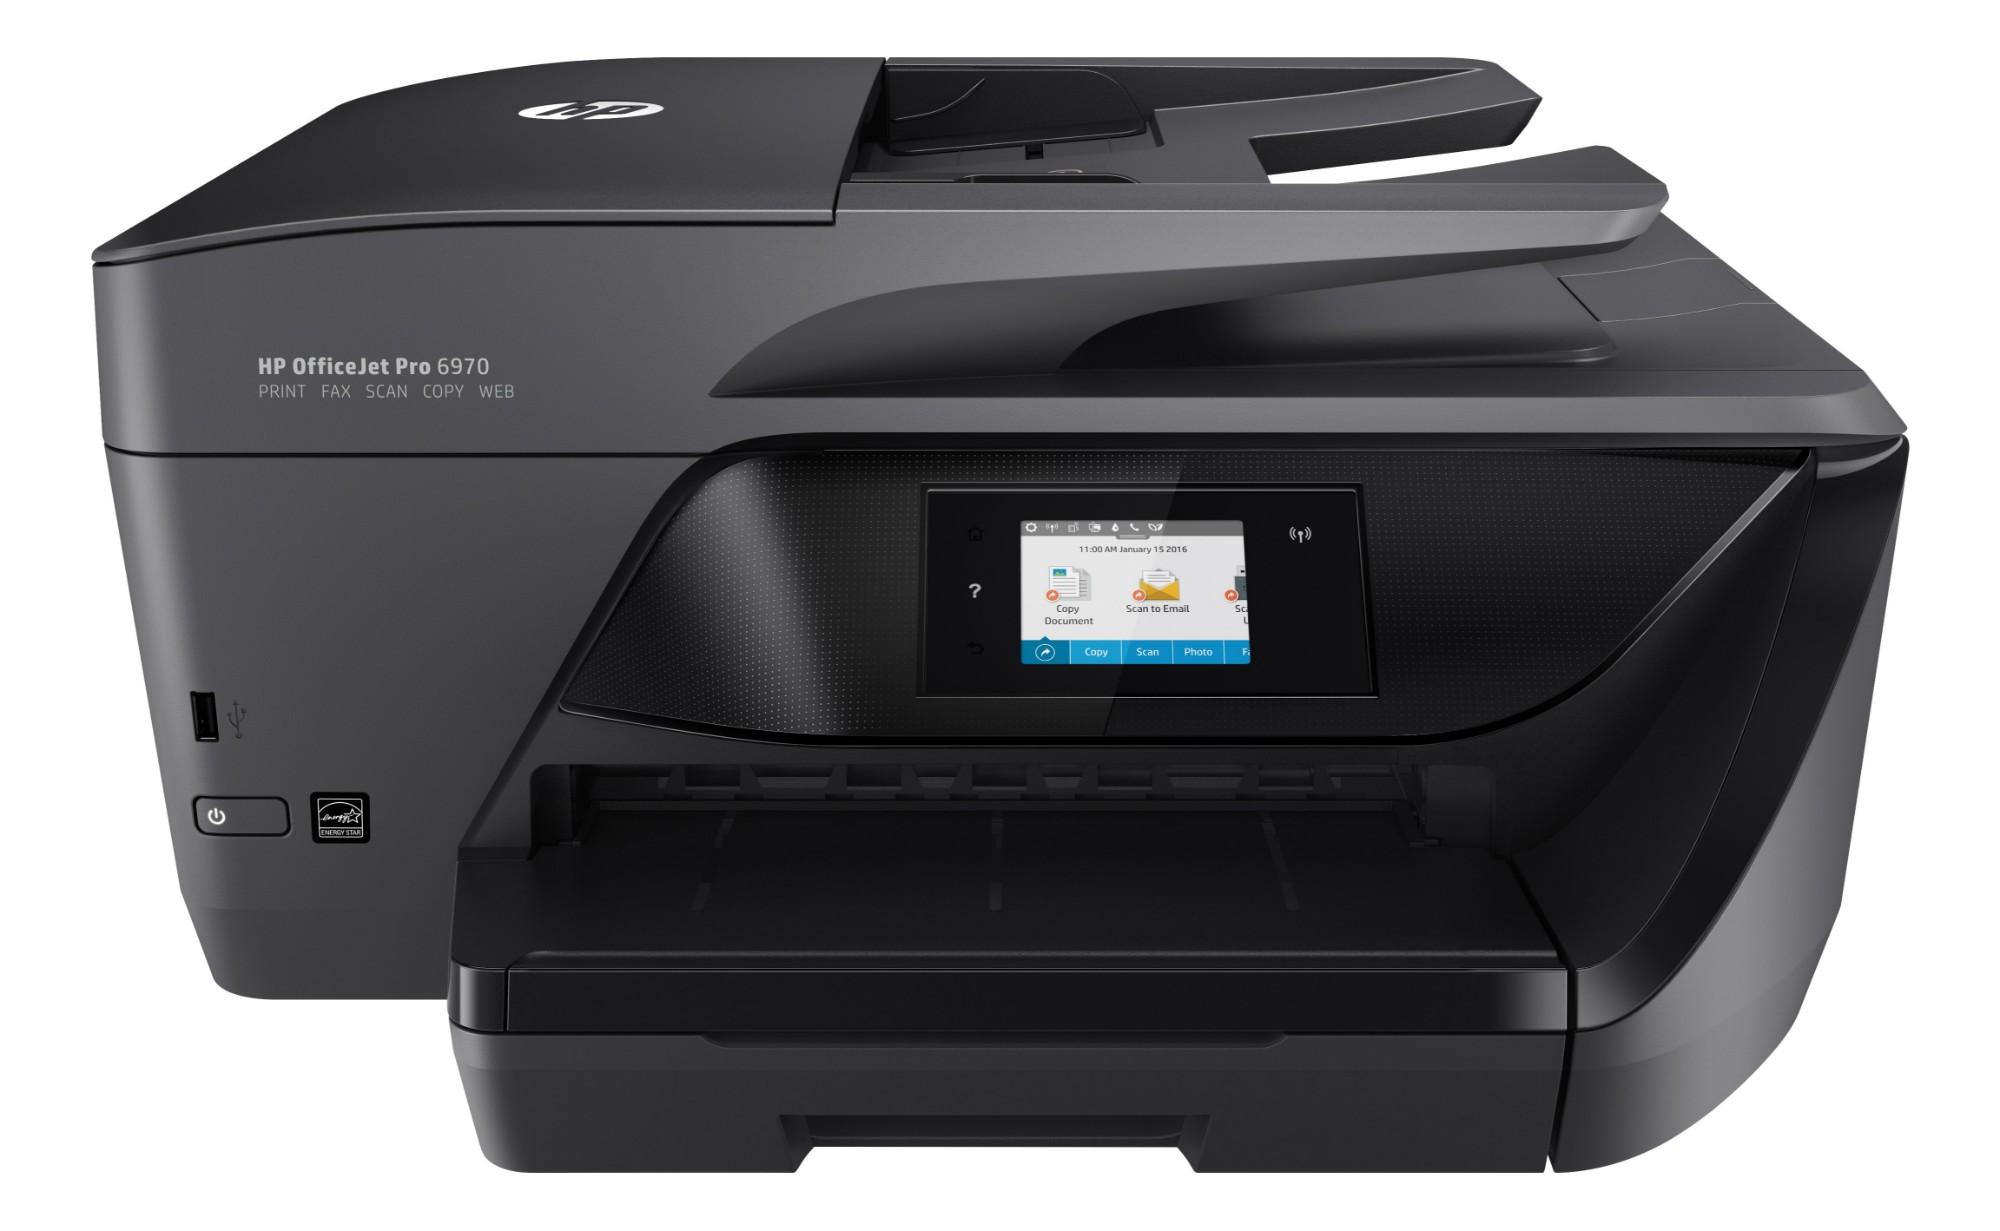 HP OfficeJet Pro 6970 Thermal Inkjet 20 ppm 600 x 1200 DPI A4 Wi-Fi